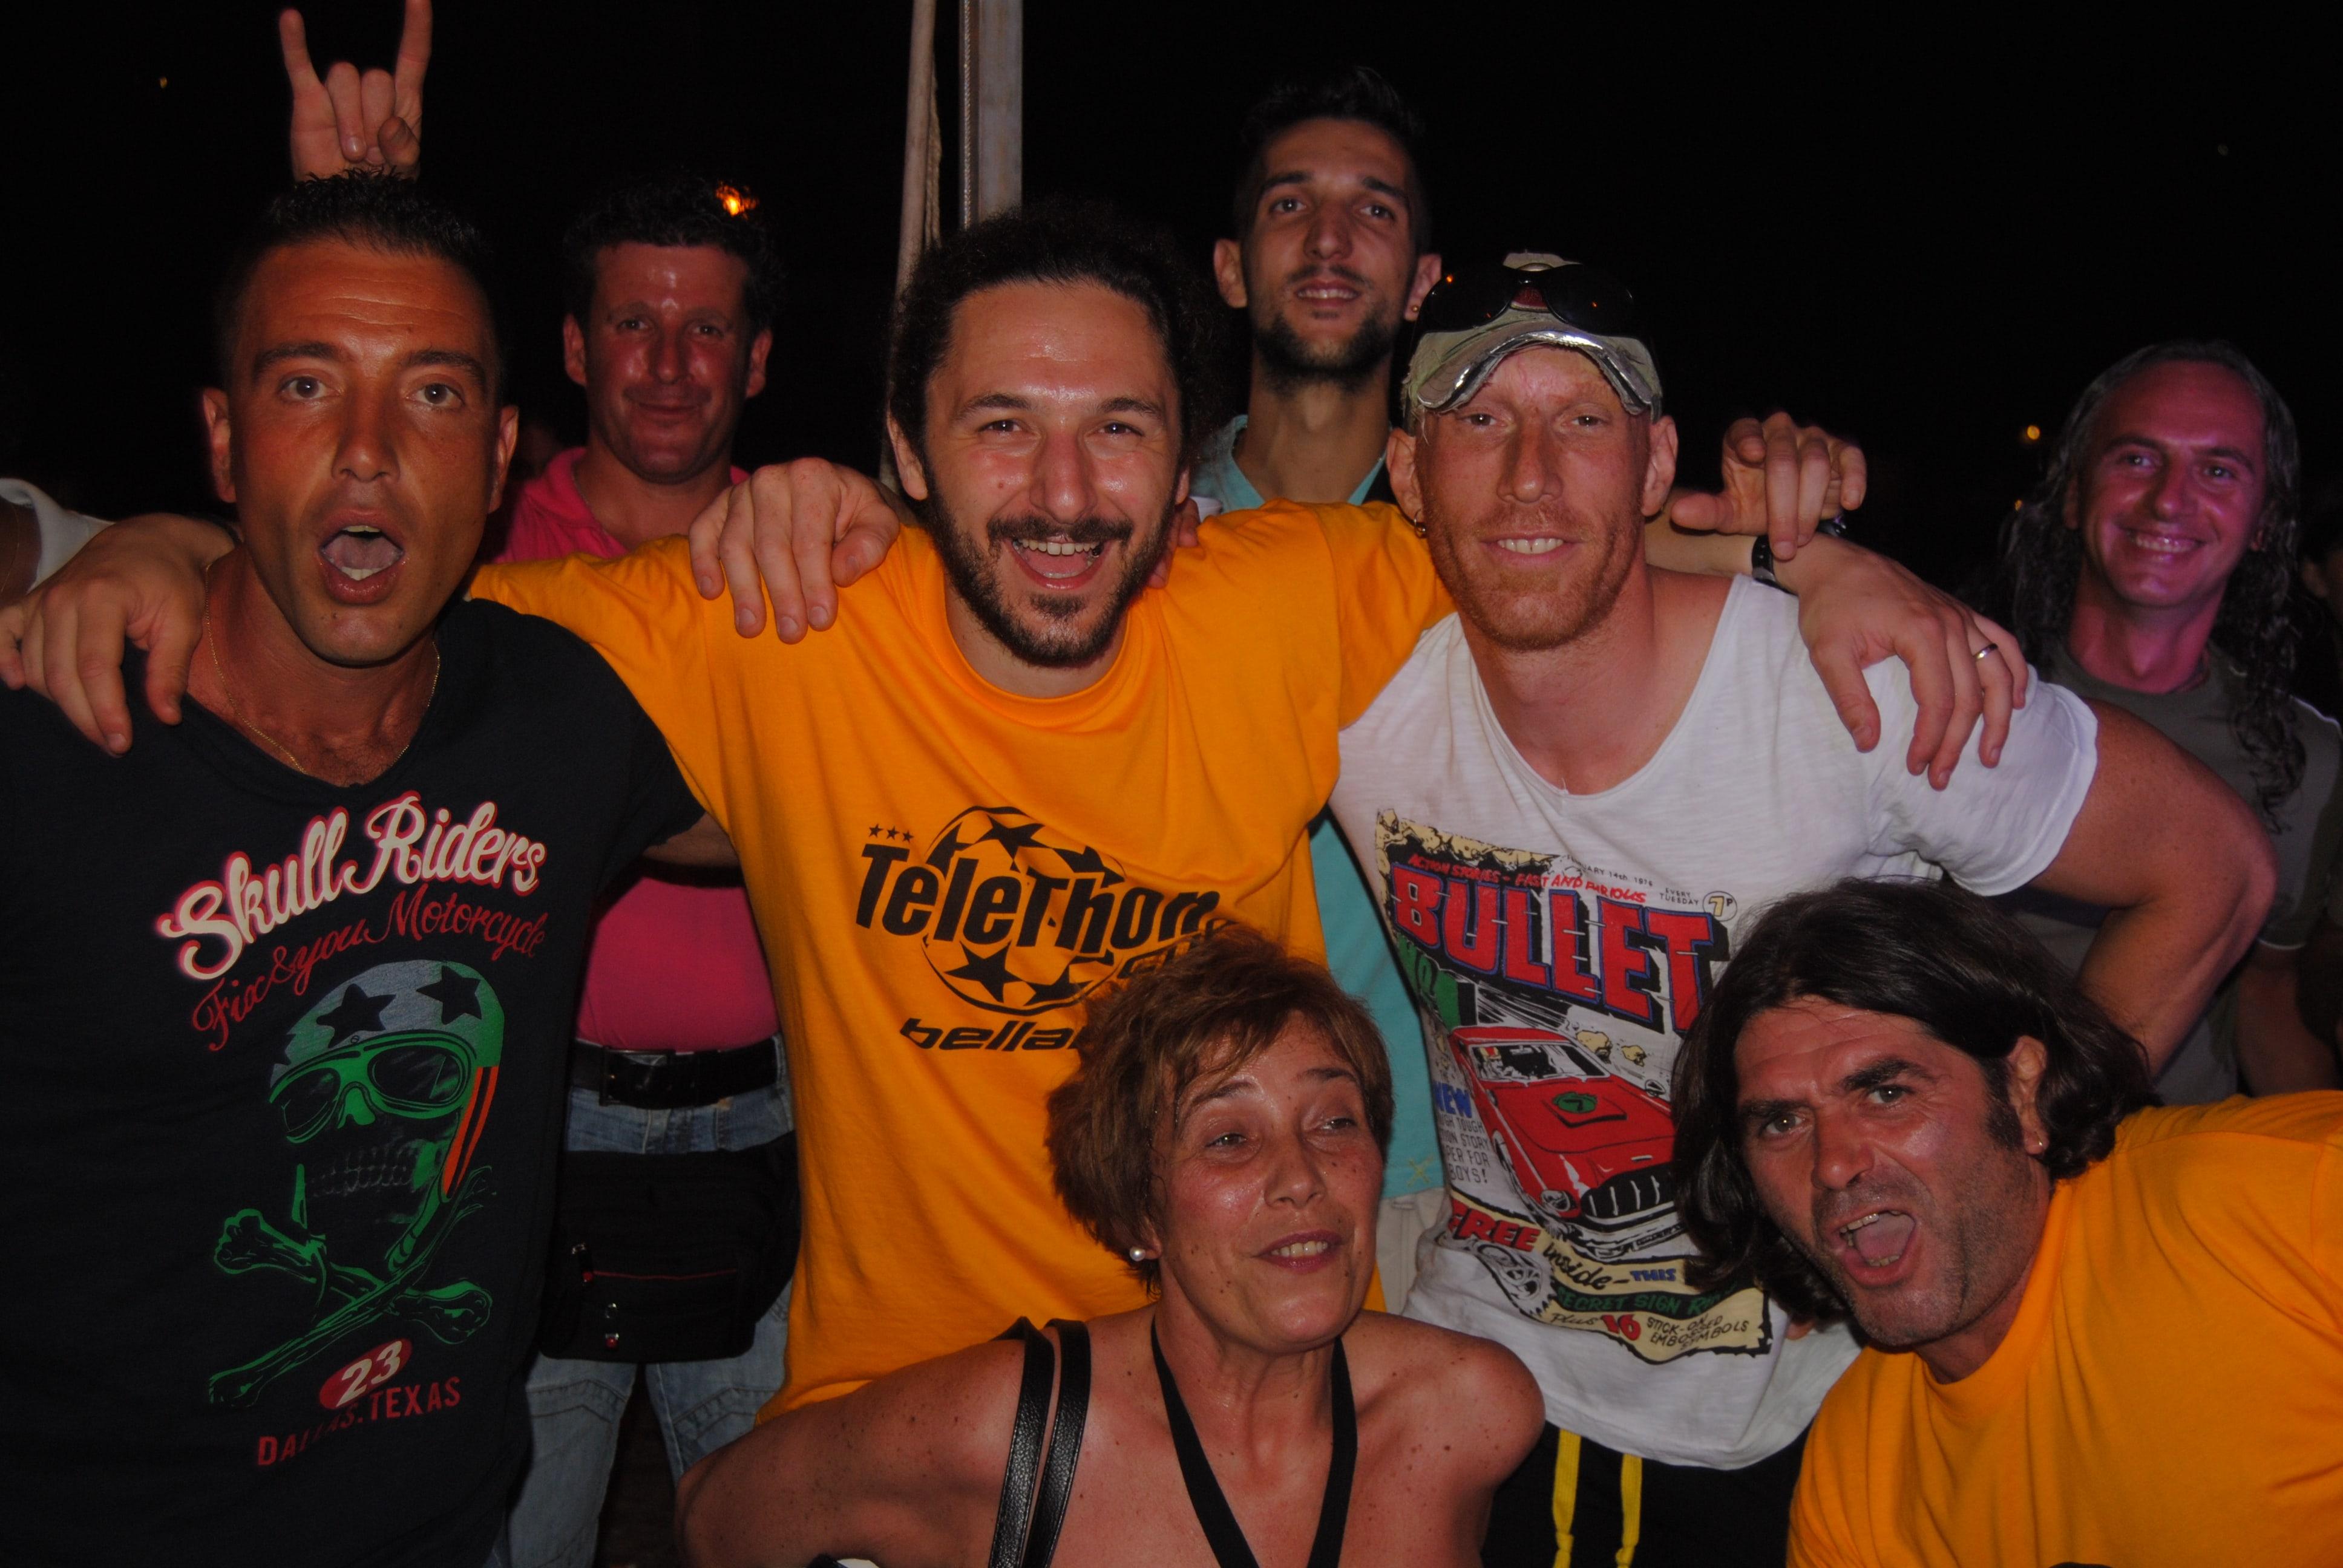 Telethon cup 2013 – vince la solidarietà